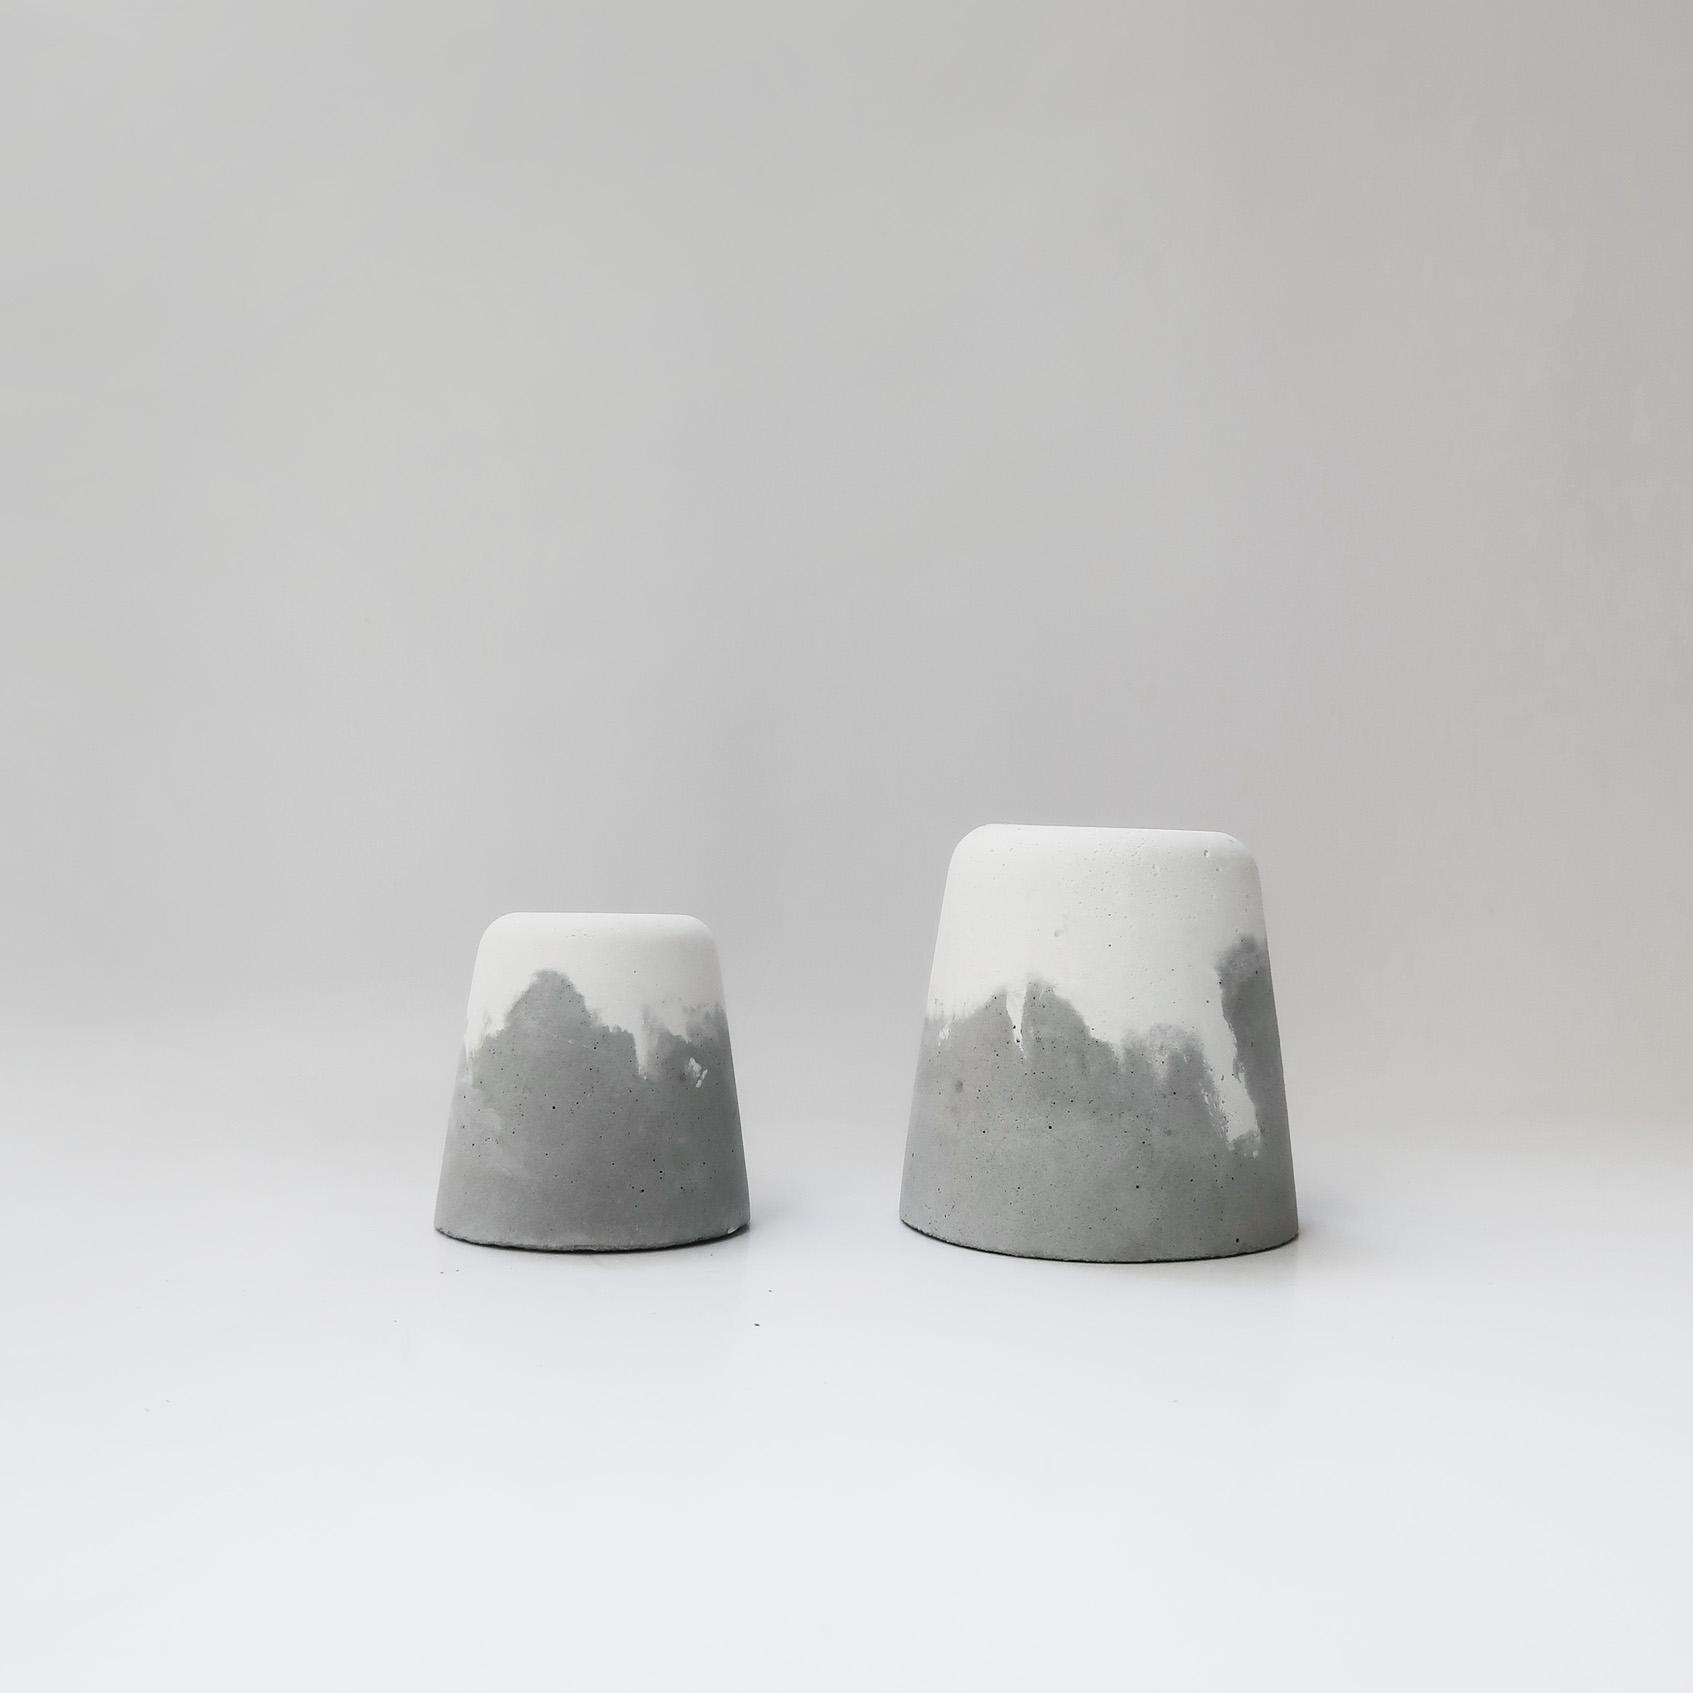 SNOW VOLCAN 雪火山水泥設計盆器・花器・置物盆